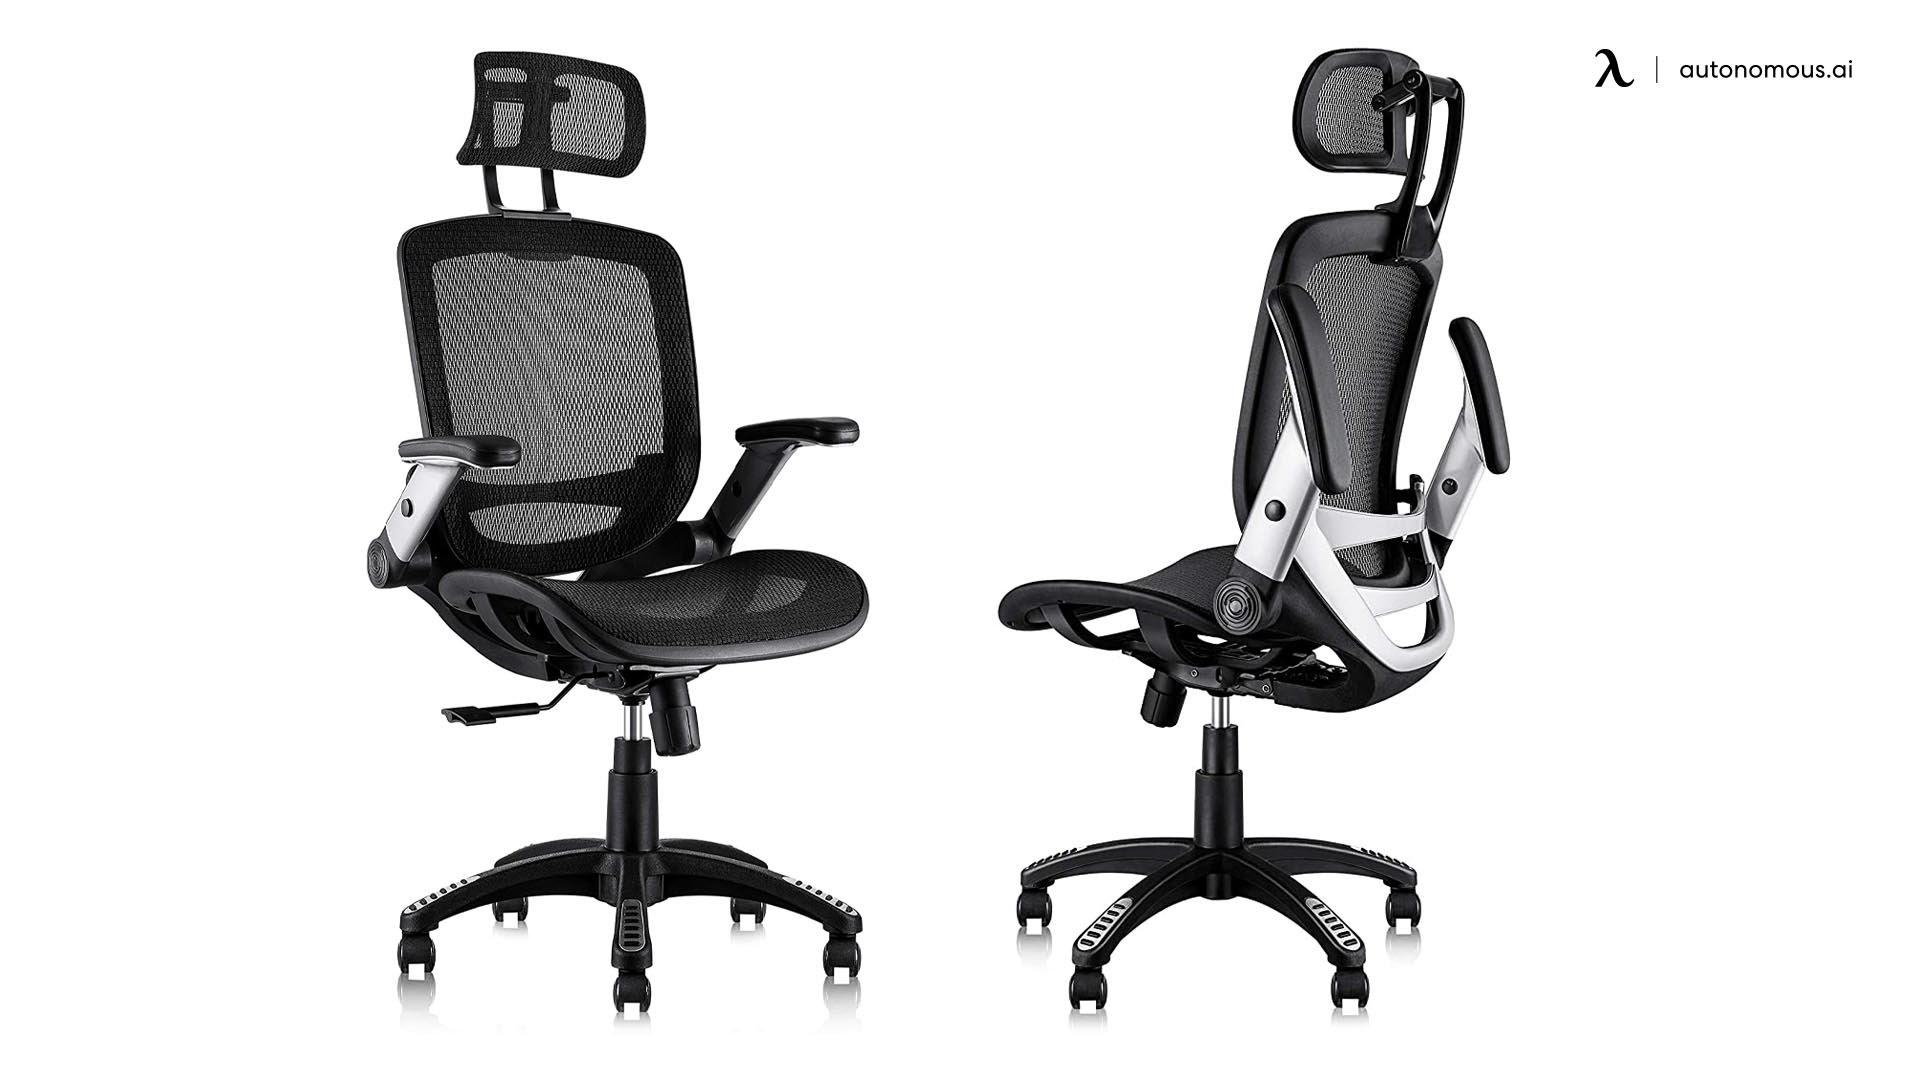 gabrylly Mesh Office Chair